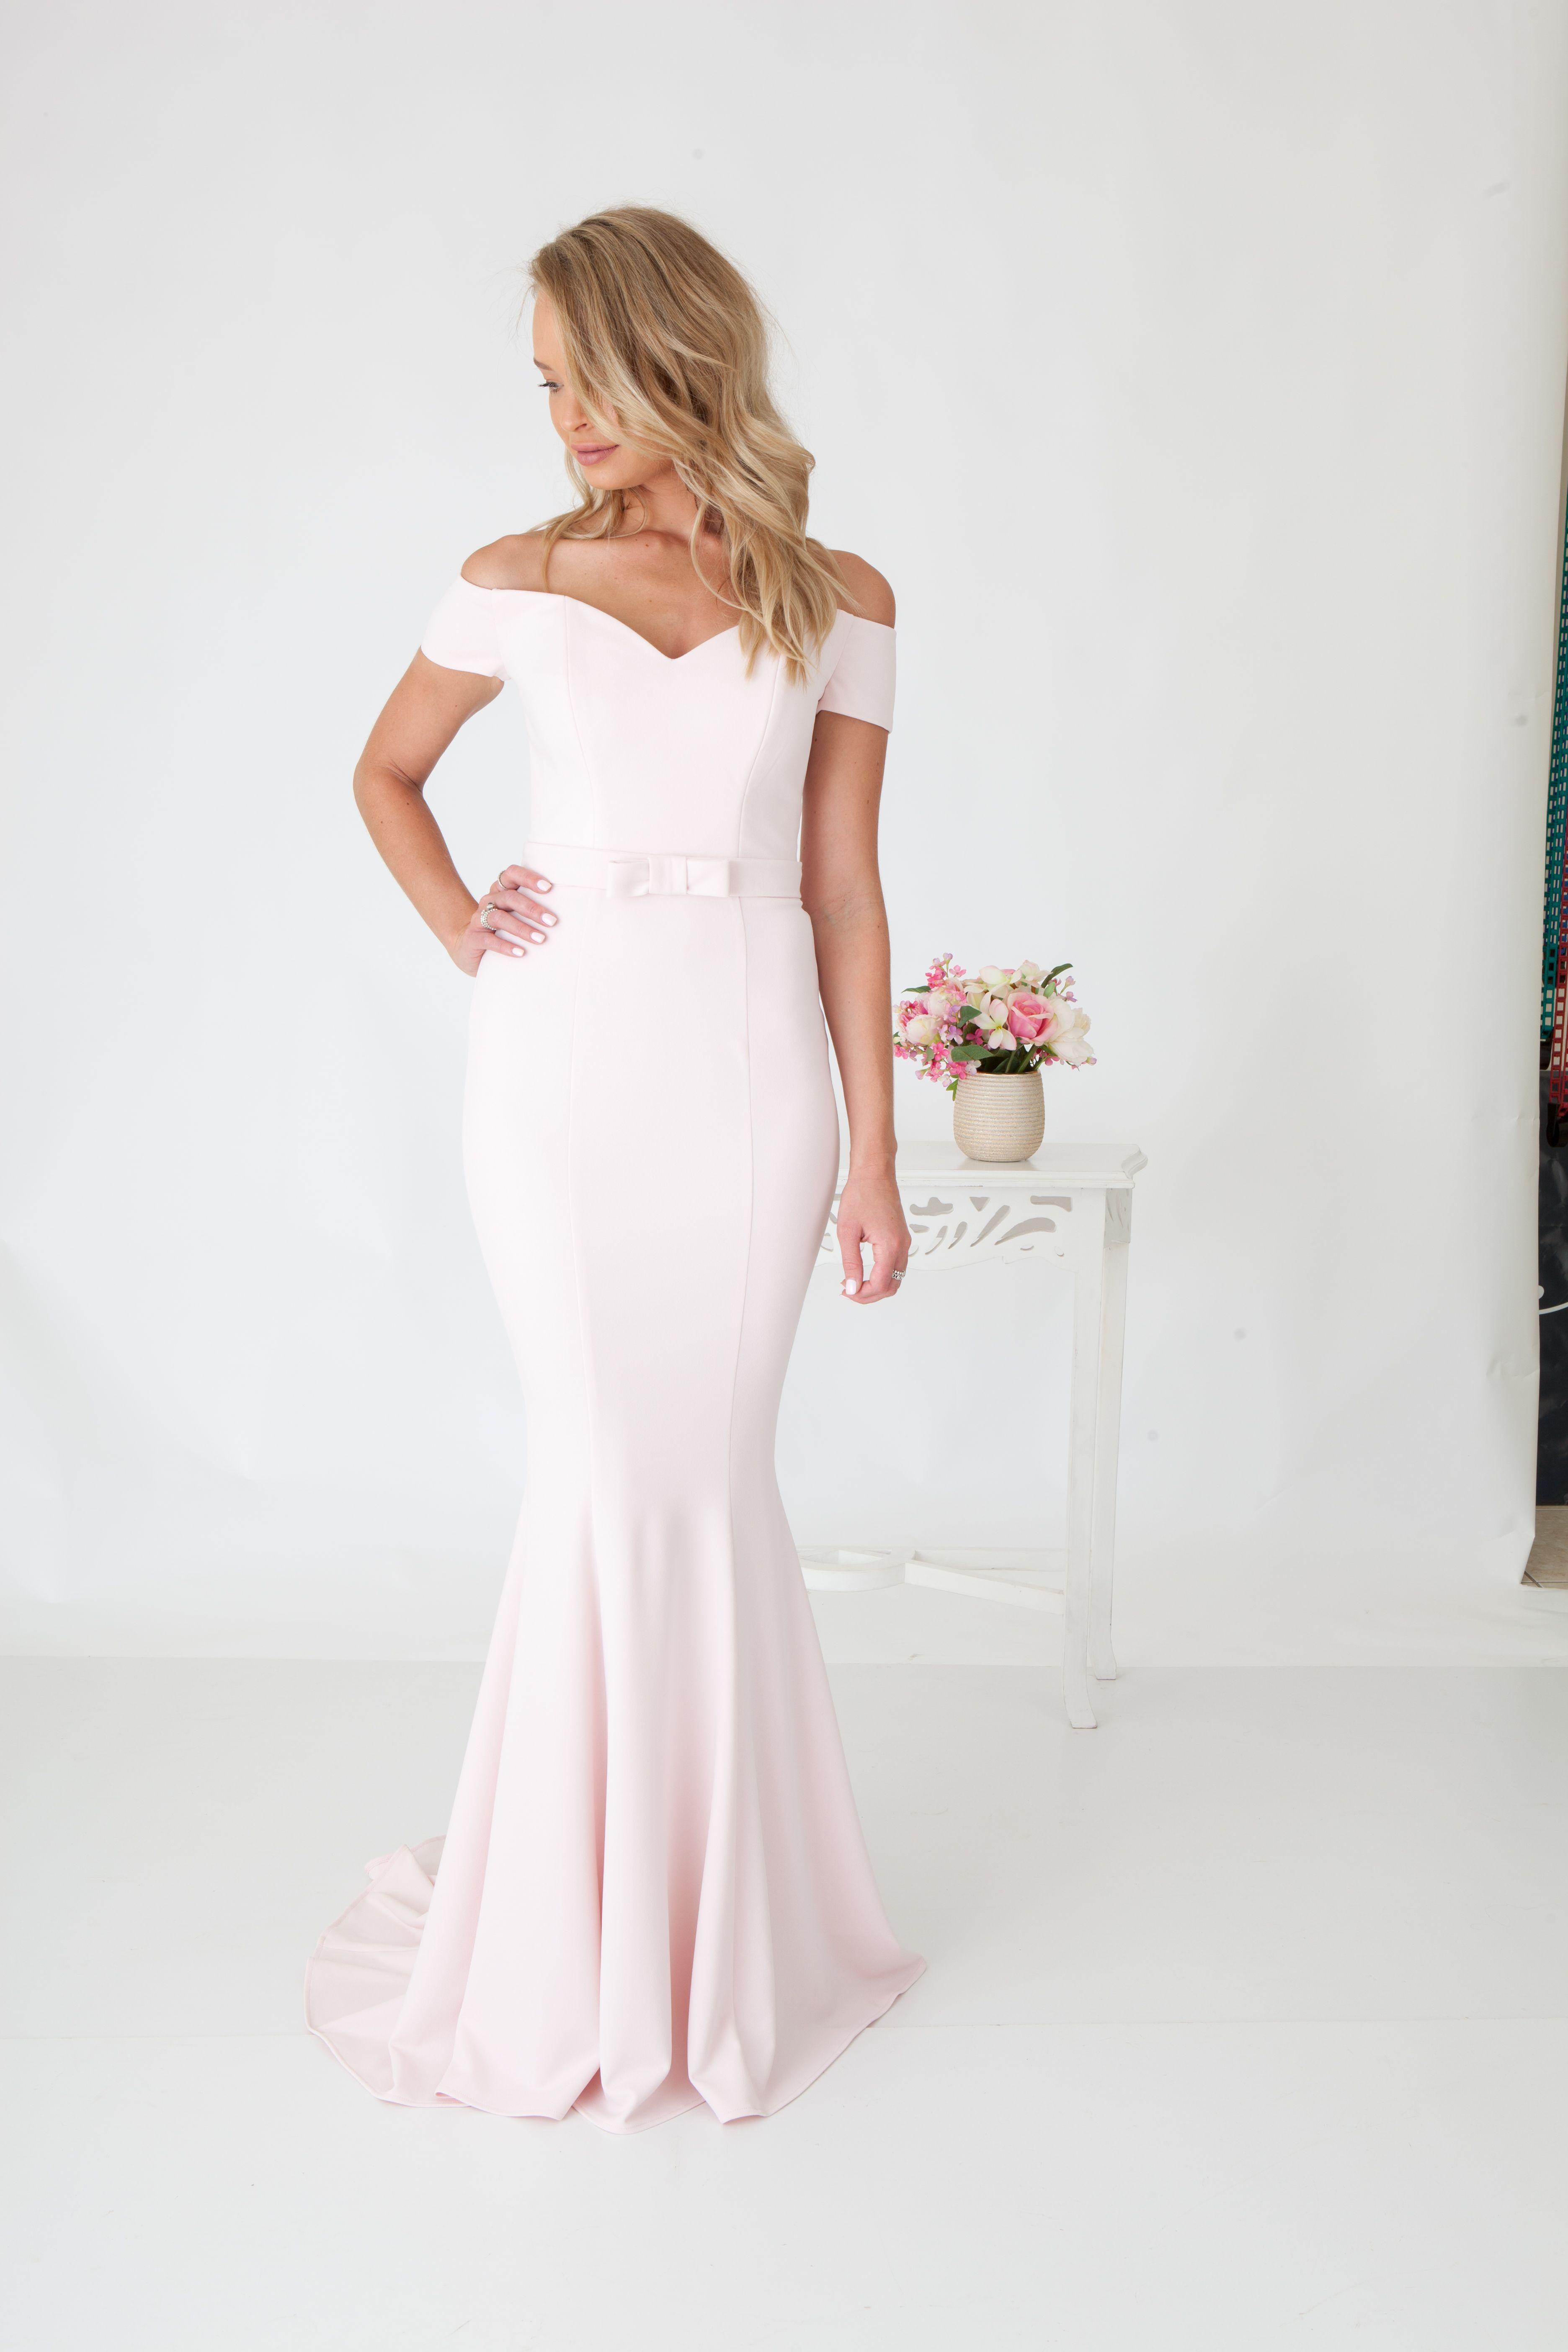 Brisbane Wedding Dress designers Euphorie Studio dig into